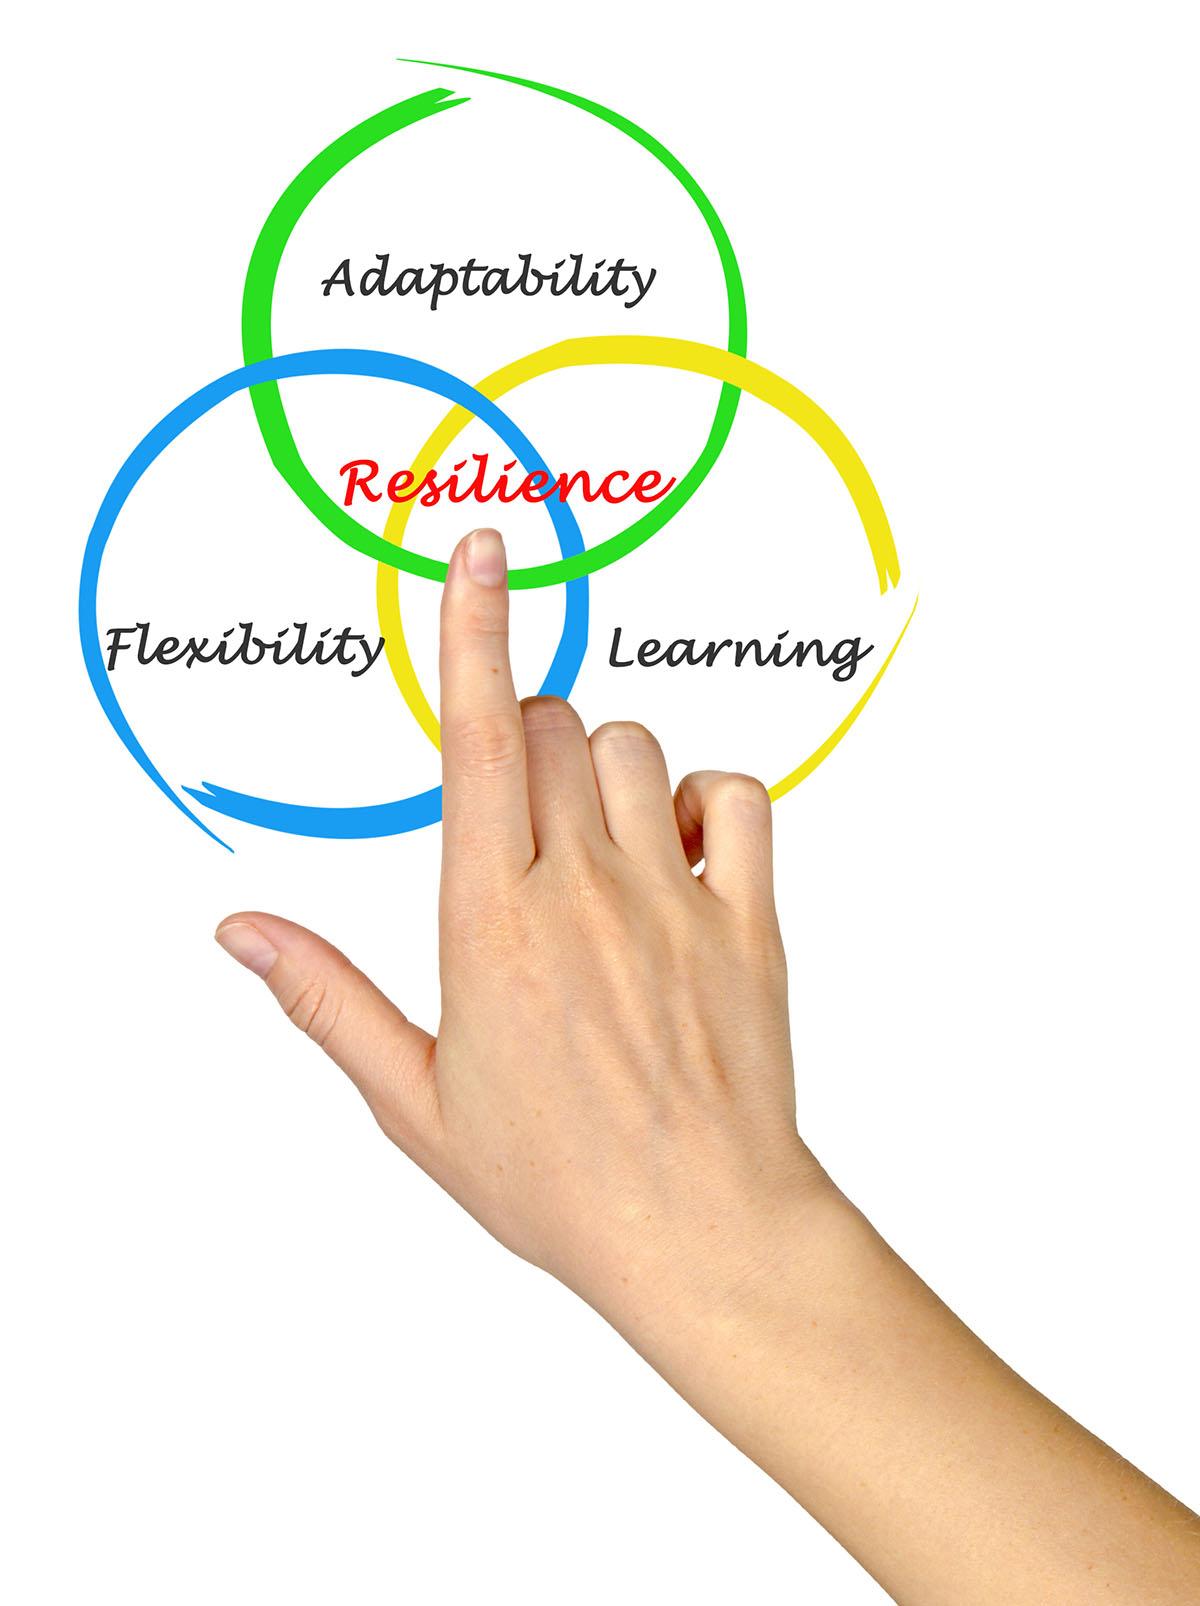 resilience-image.jpg